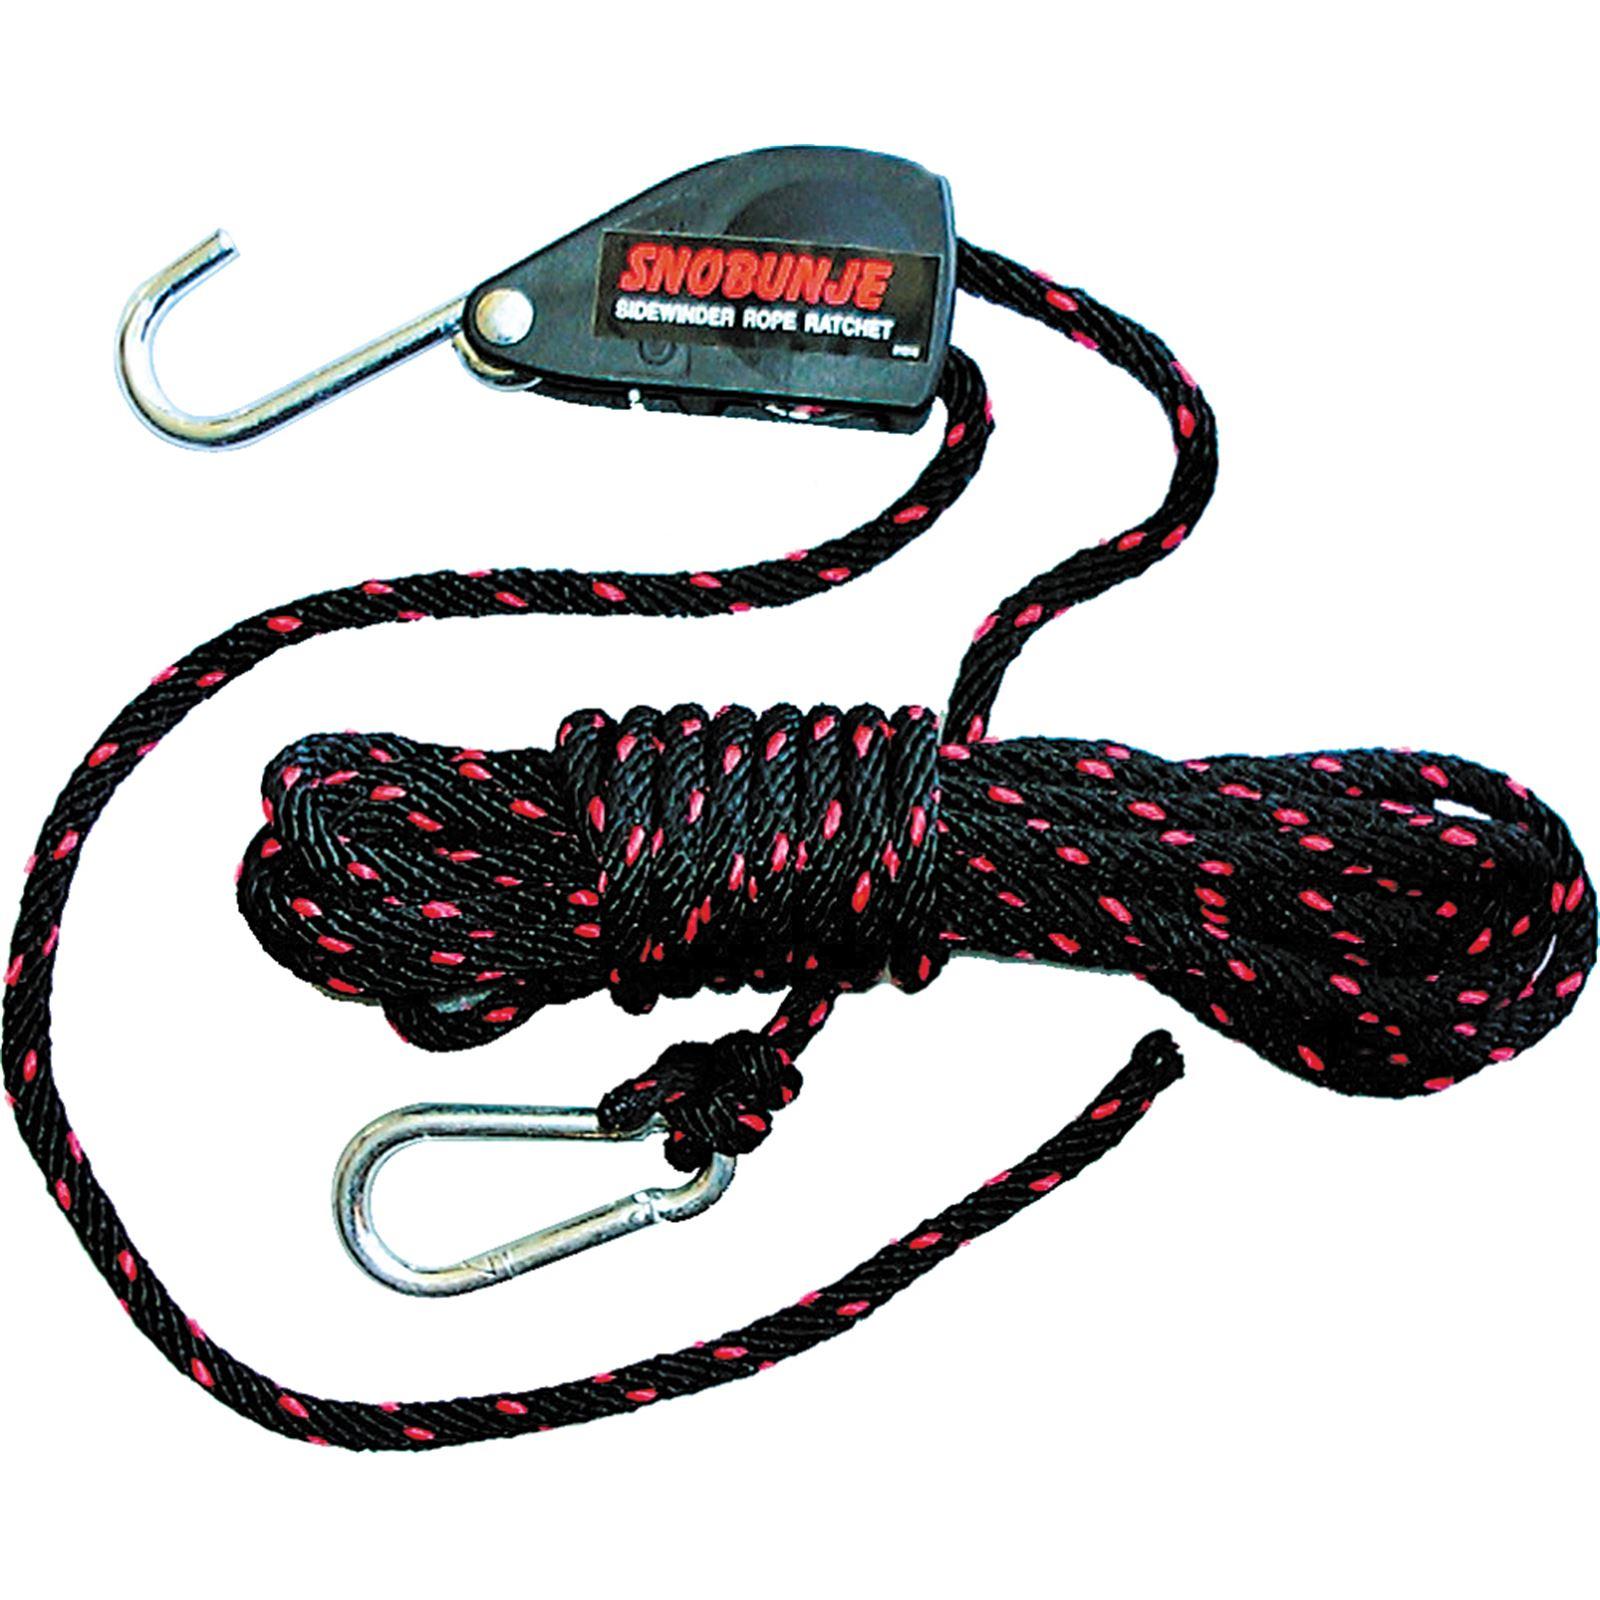 Snobunje Sidewinder Ratchet Block w/Rope